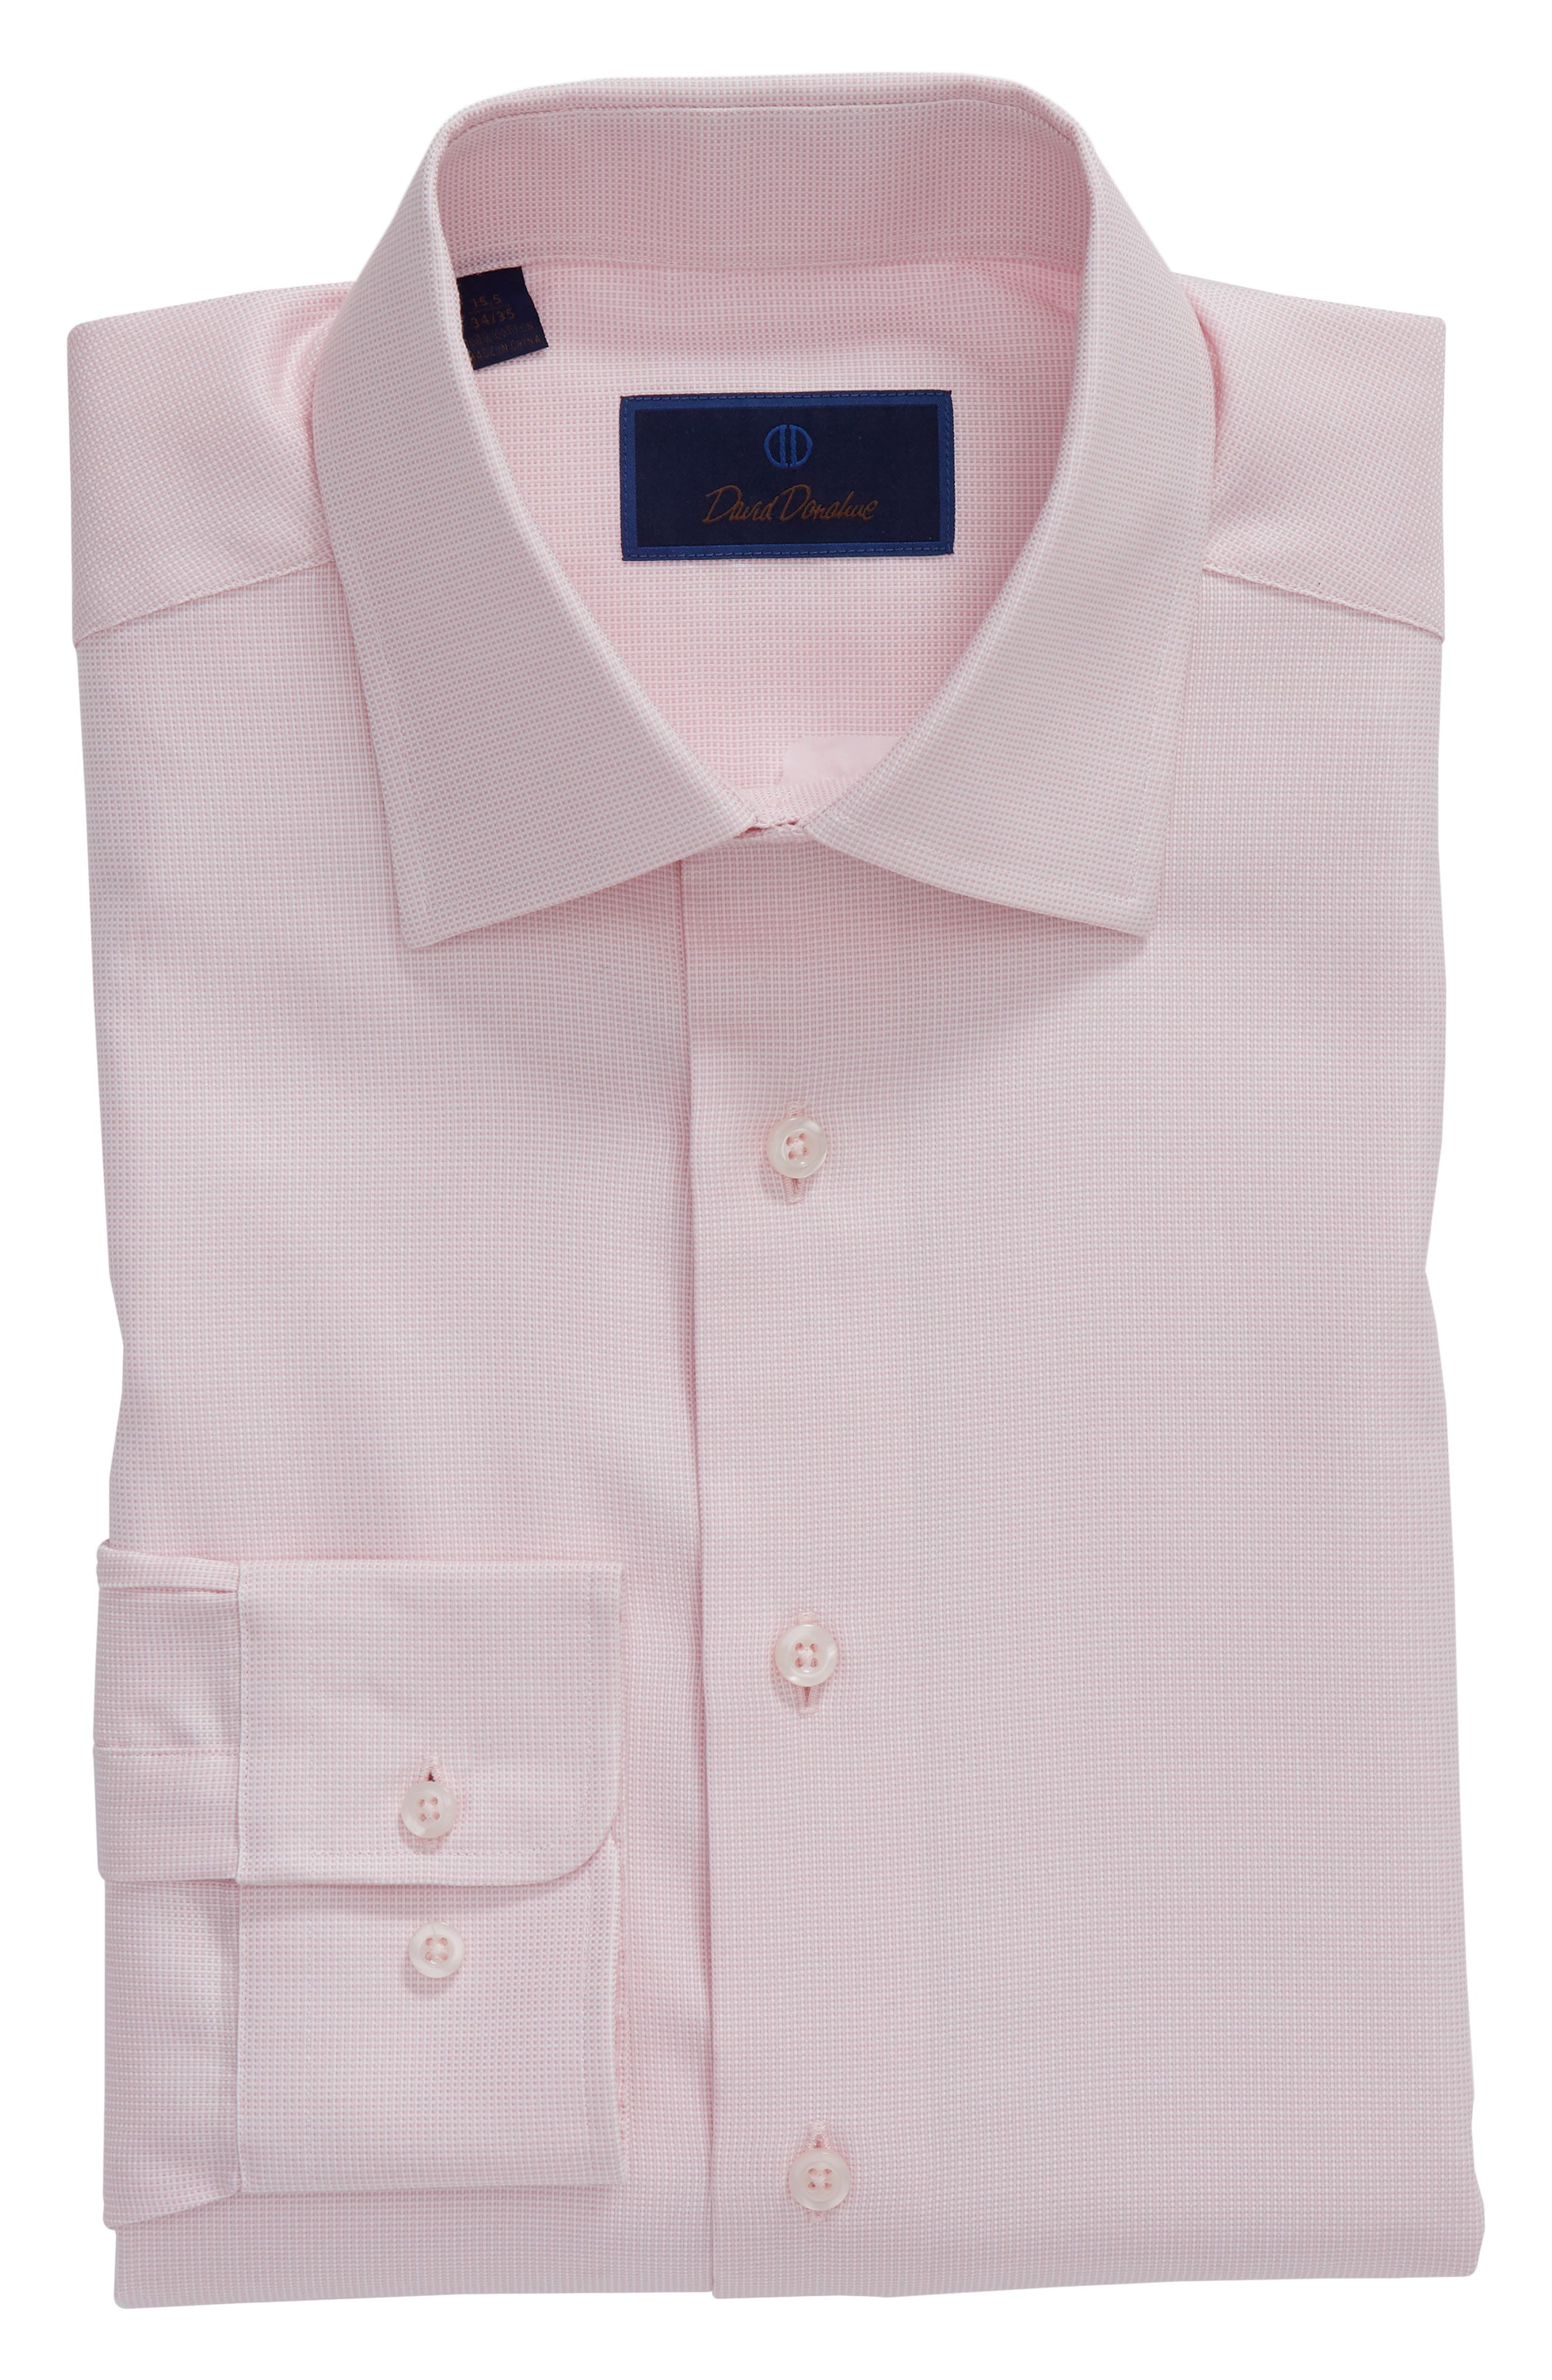 Regular Fit Solid Dress Shirt,                             Alternate thumbnail 5, color,                             PINK